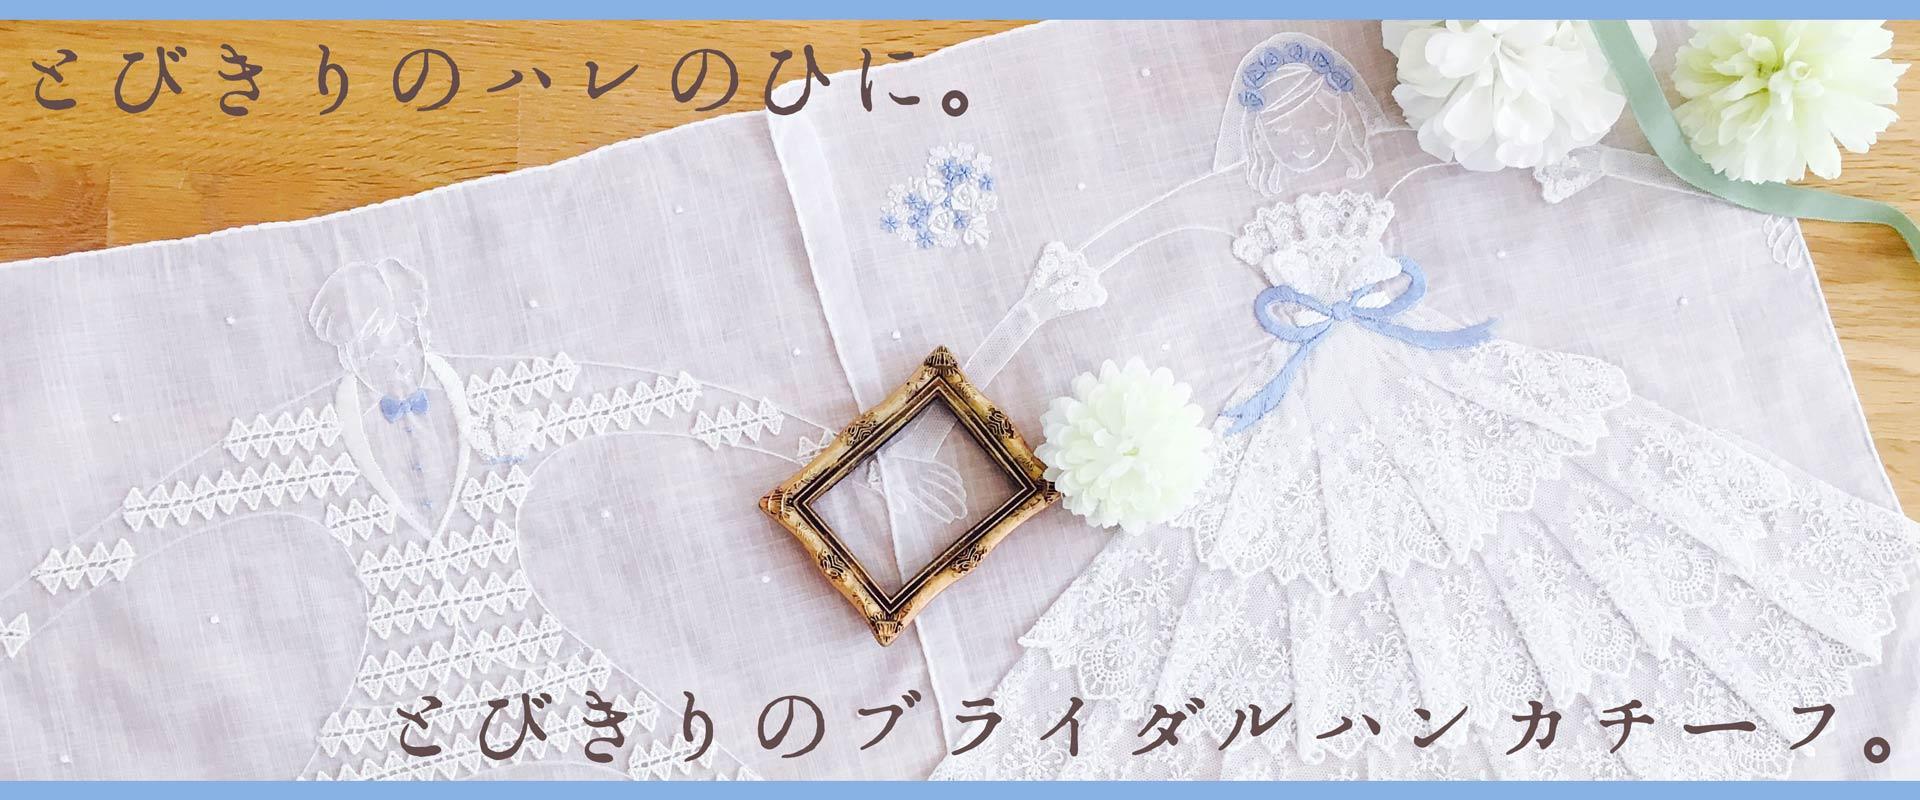 Bridal_8_1920_800